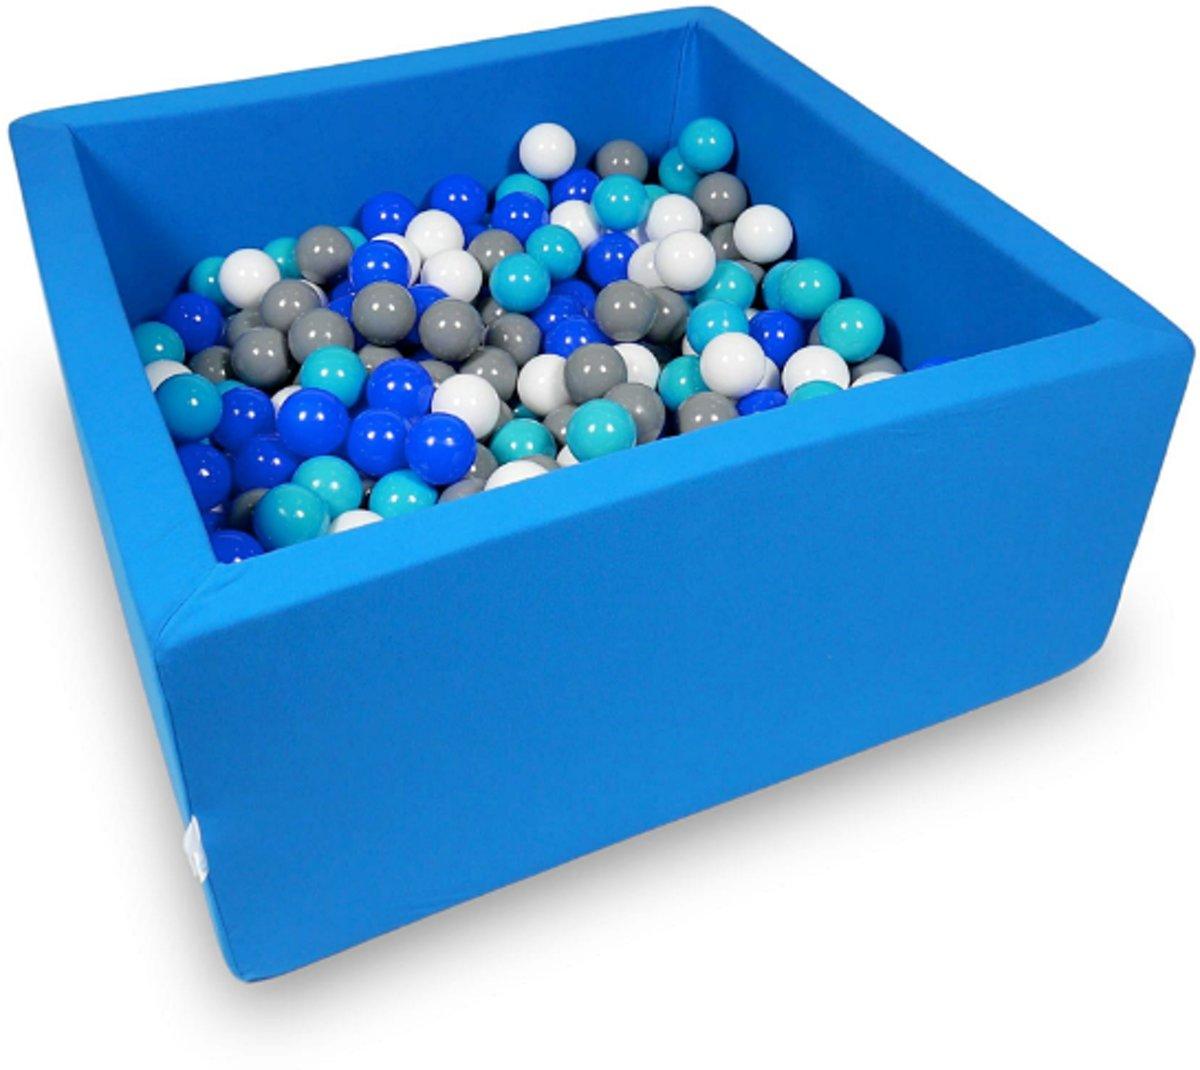 Ballenbak - 400 ballen - 90 x 90 x 40 cm - ballenbad - vierkant blauw